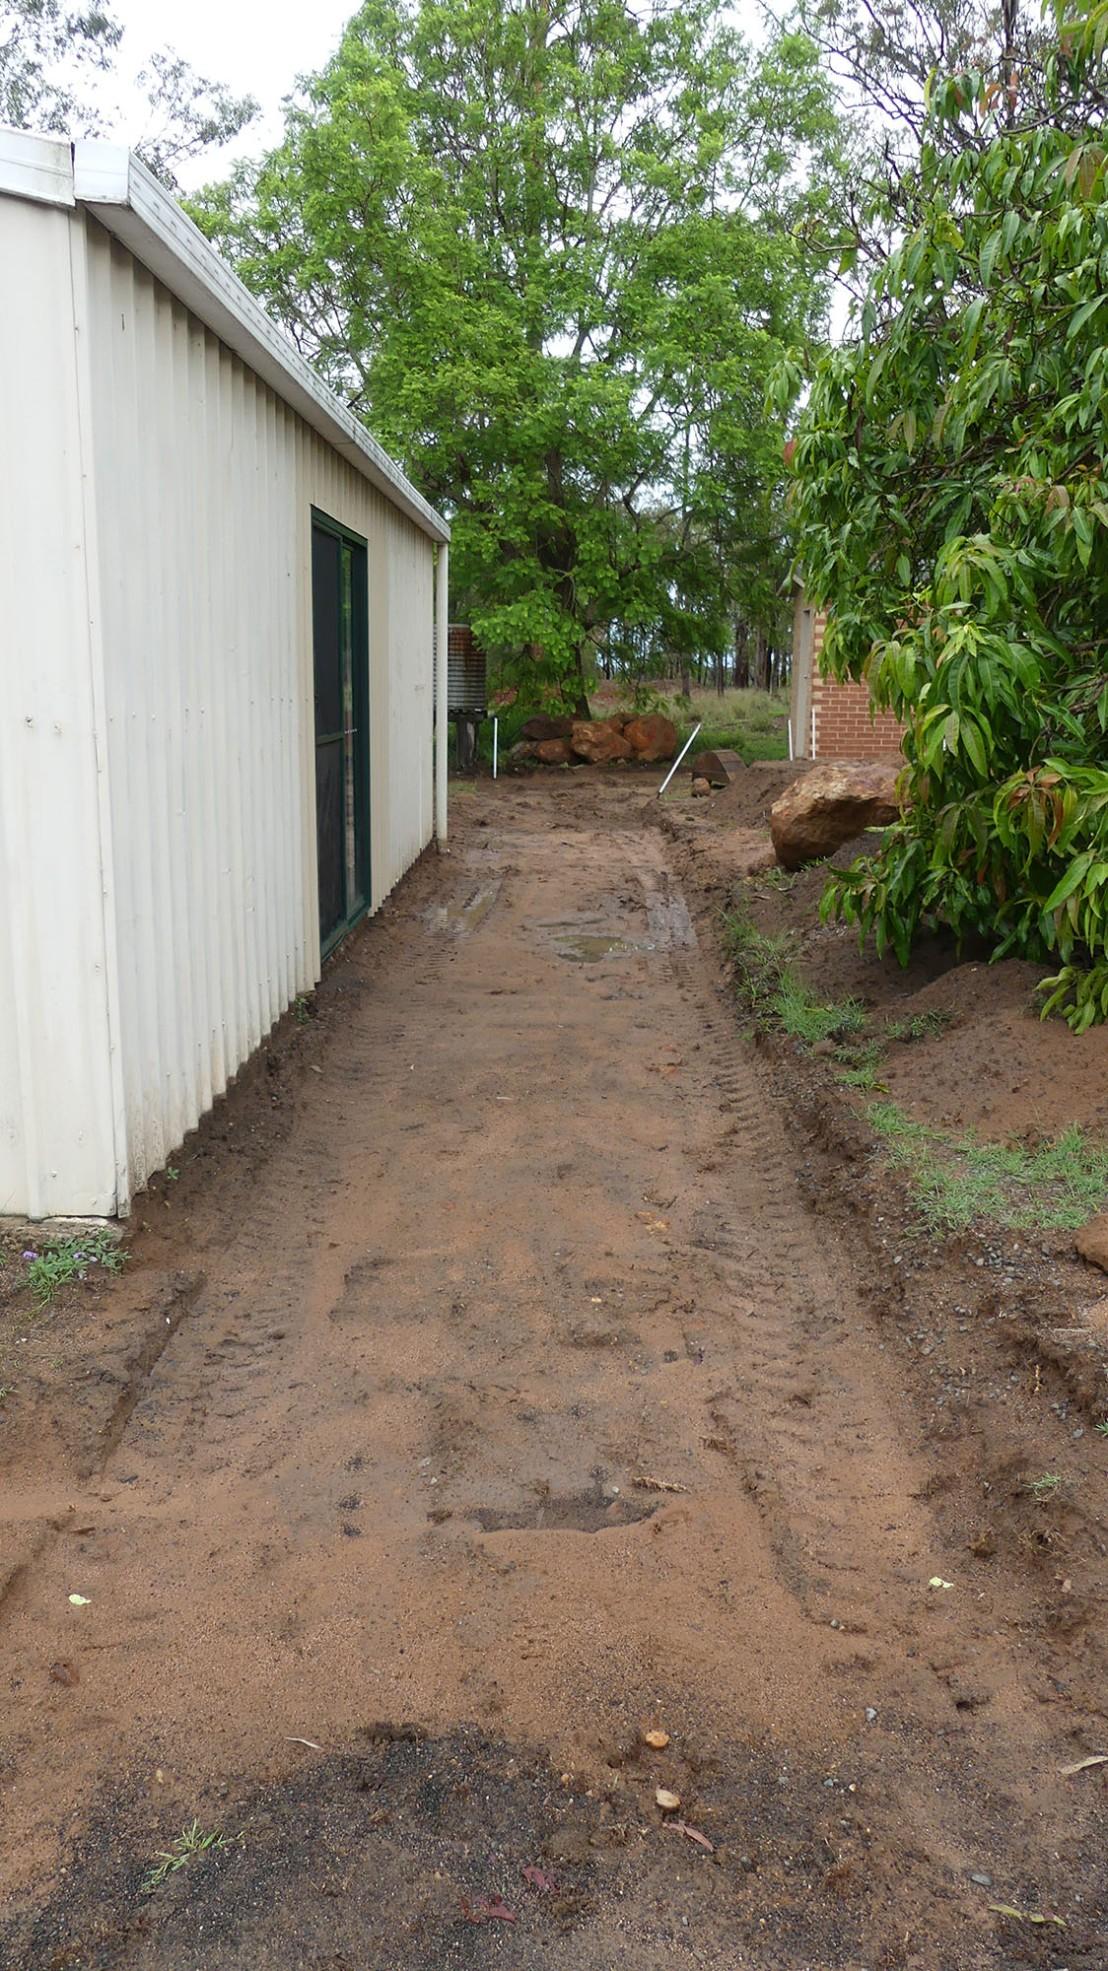 Hostel pathway preparation, February 2020.